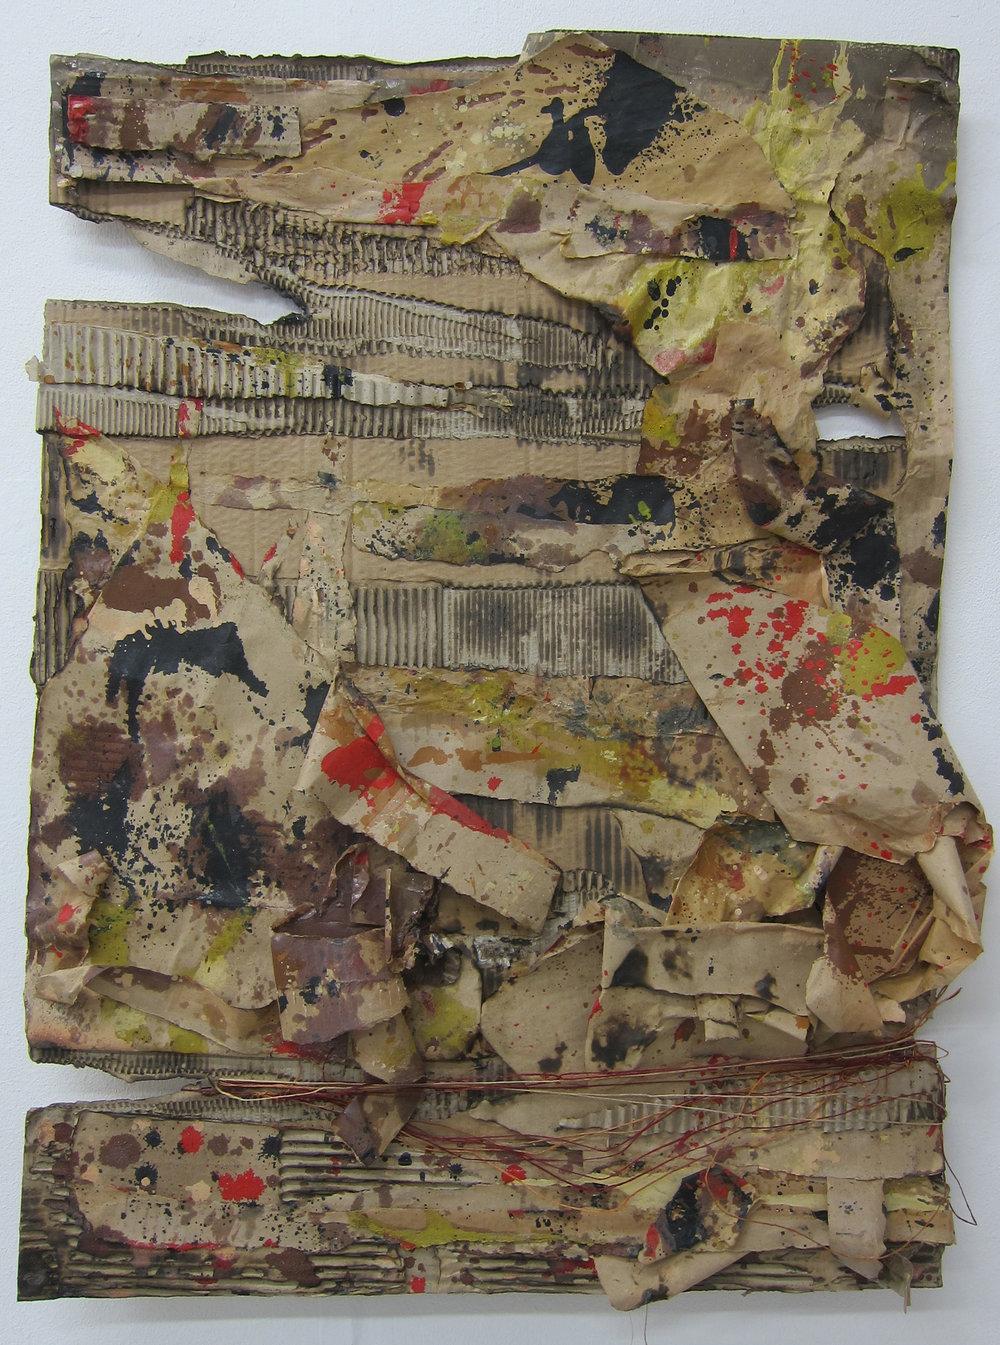 Detritus.   Cardboard, paper, cotton, alkyd resin &fire.  80 x 58 cm.  2015.